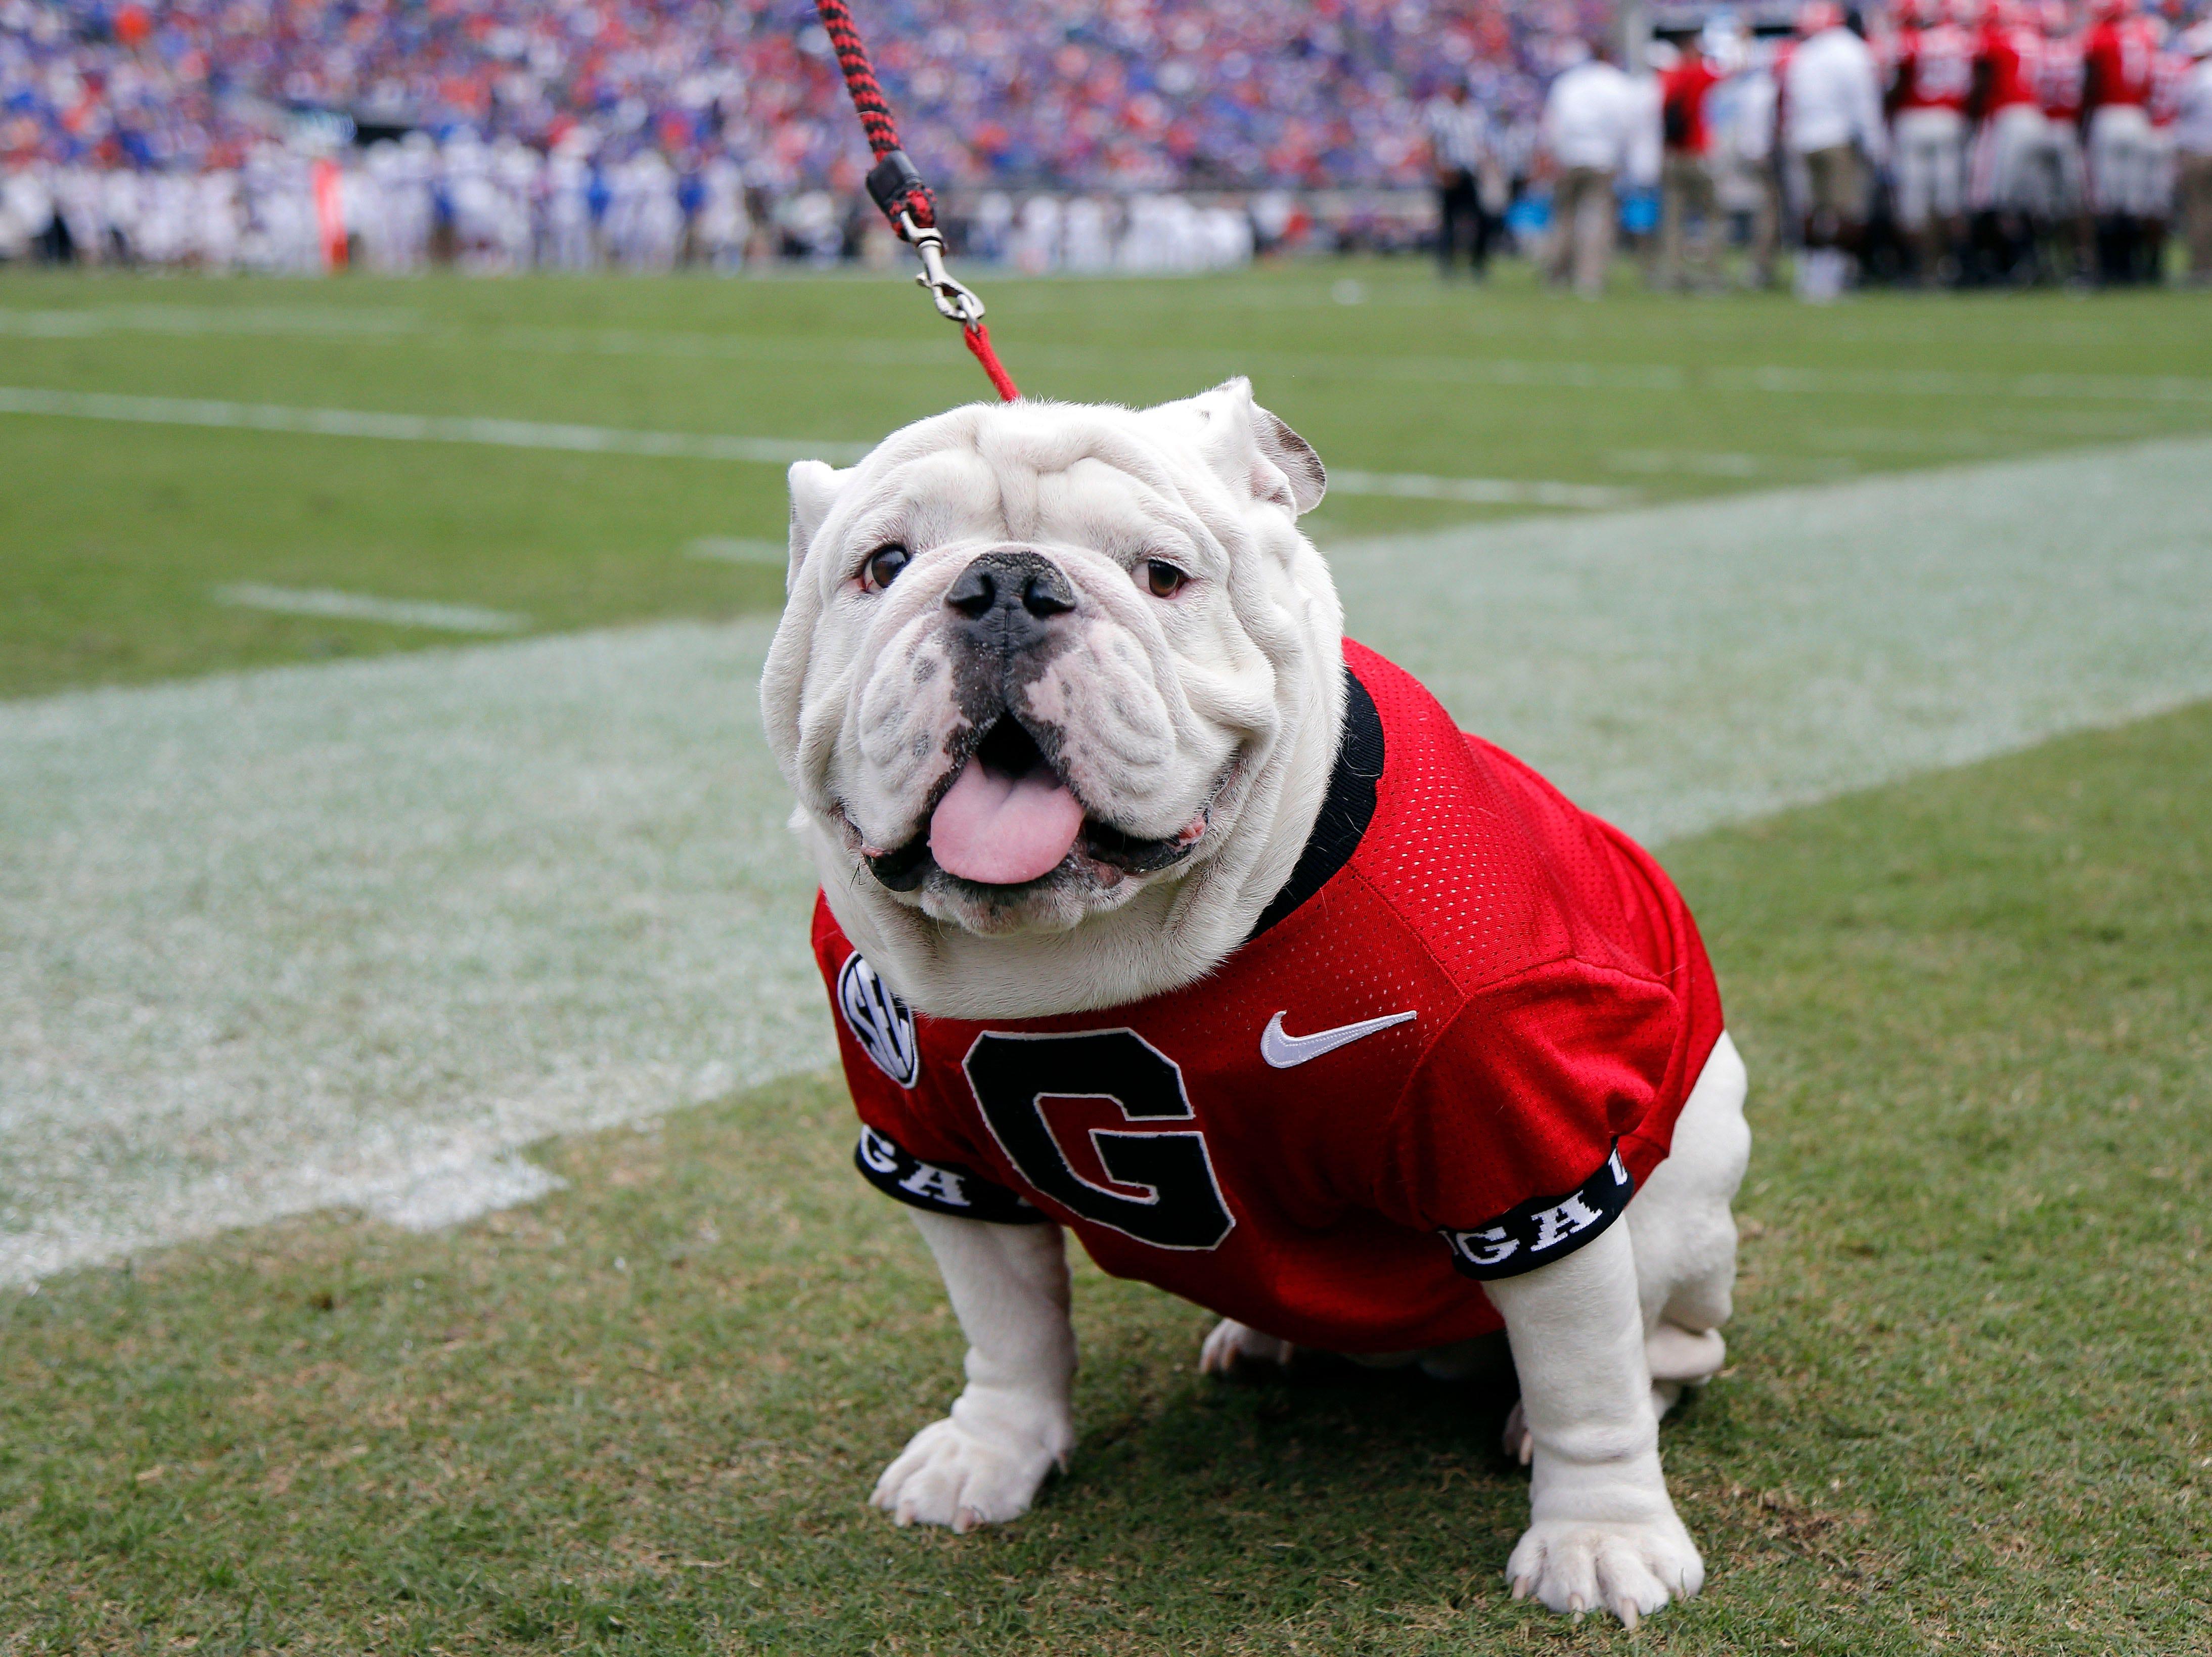 Week 9: Georgia Bulldogs mascot UGA on the field during the Florida-Georgia game.